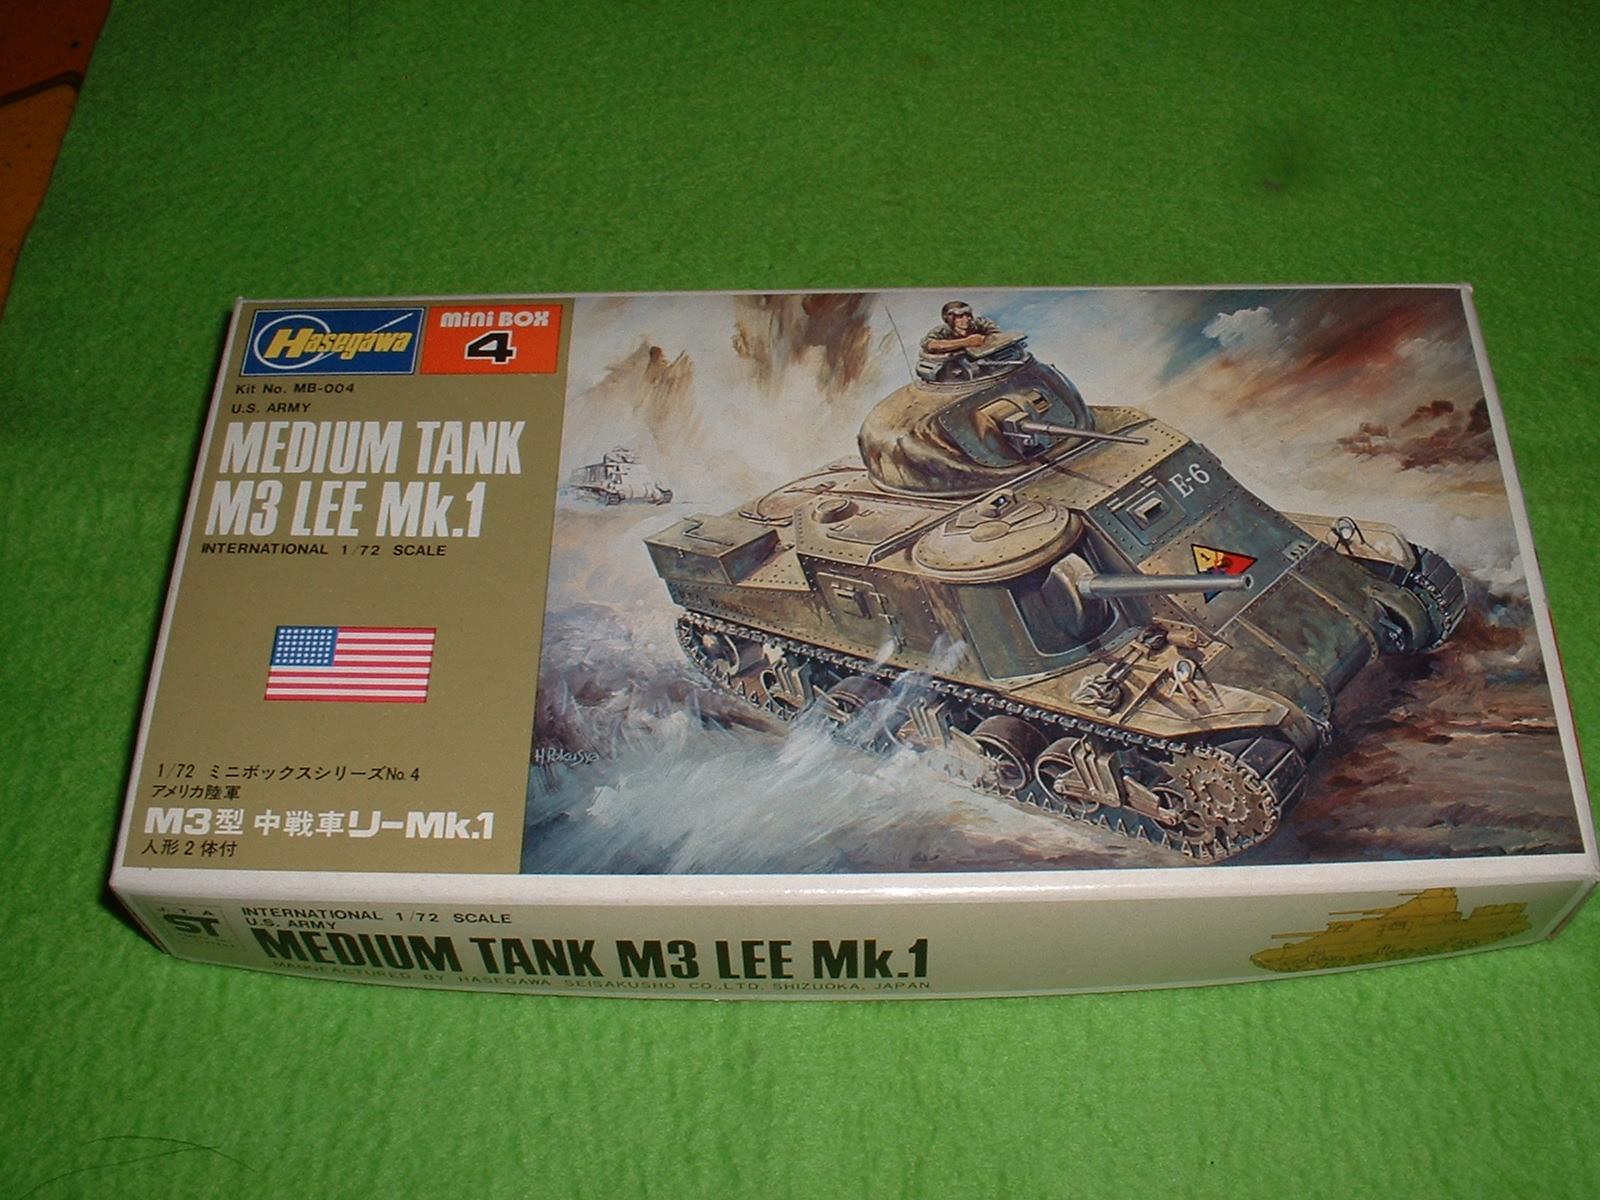 mp「タイインターセプター」にパーツを転用した ハセガワ「M3 リー戦車」 Doburoku-TAO.JPG